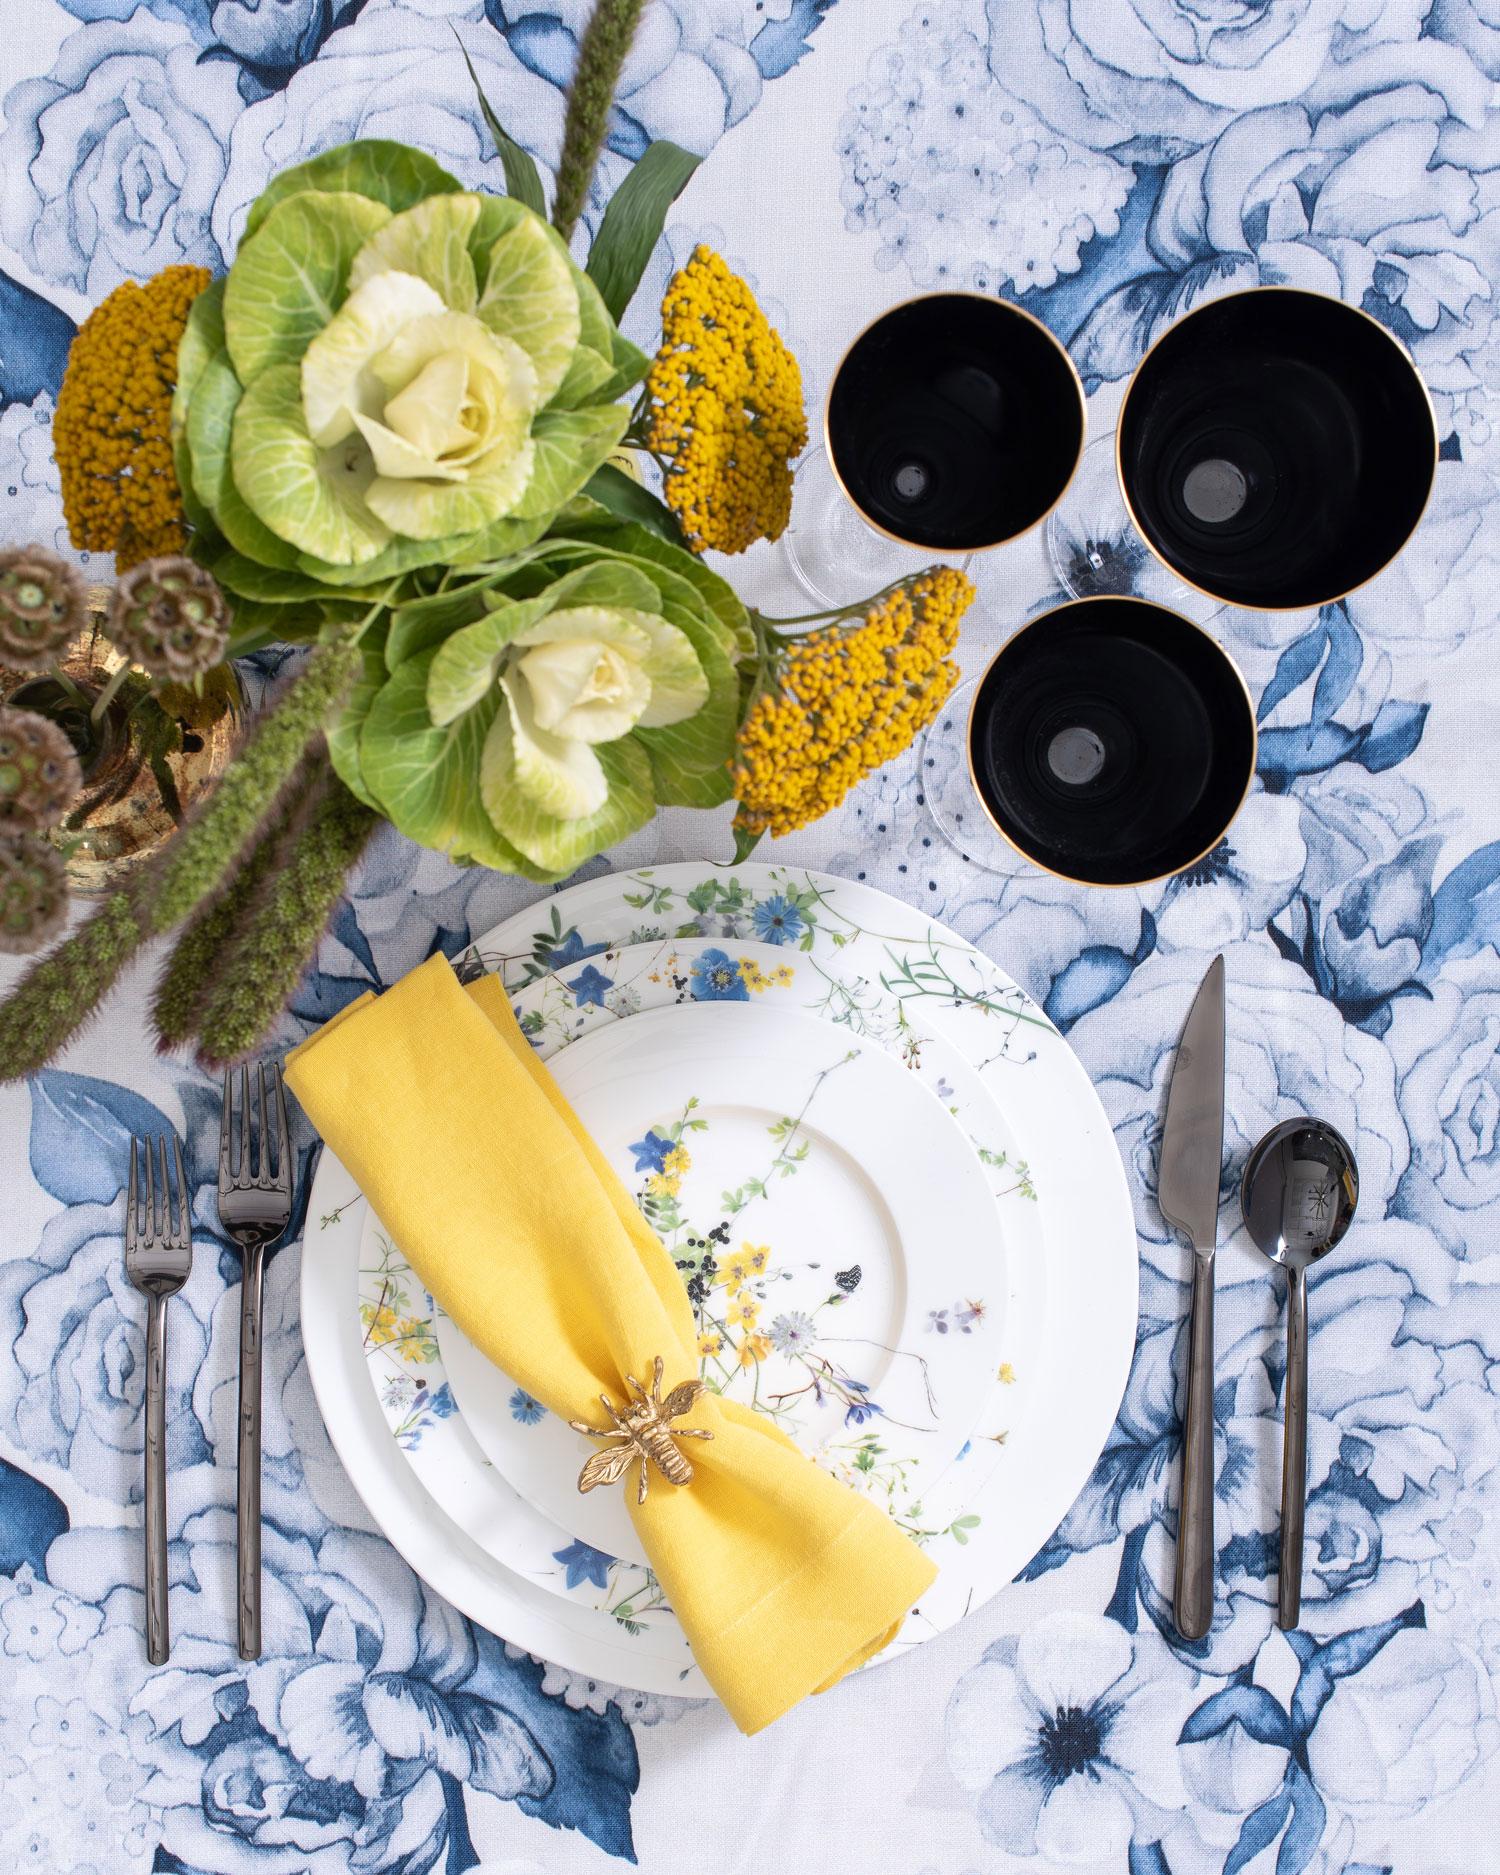 maison de carine floral print yellow napkin place setting luxury wedding ideas carine krawiec